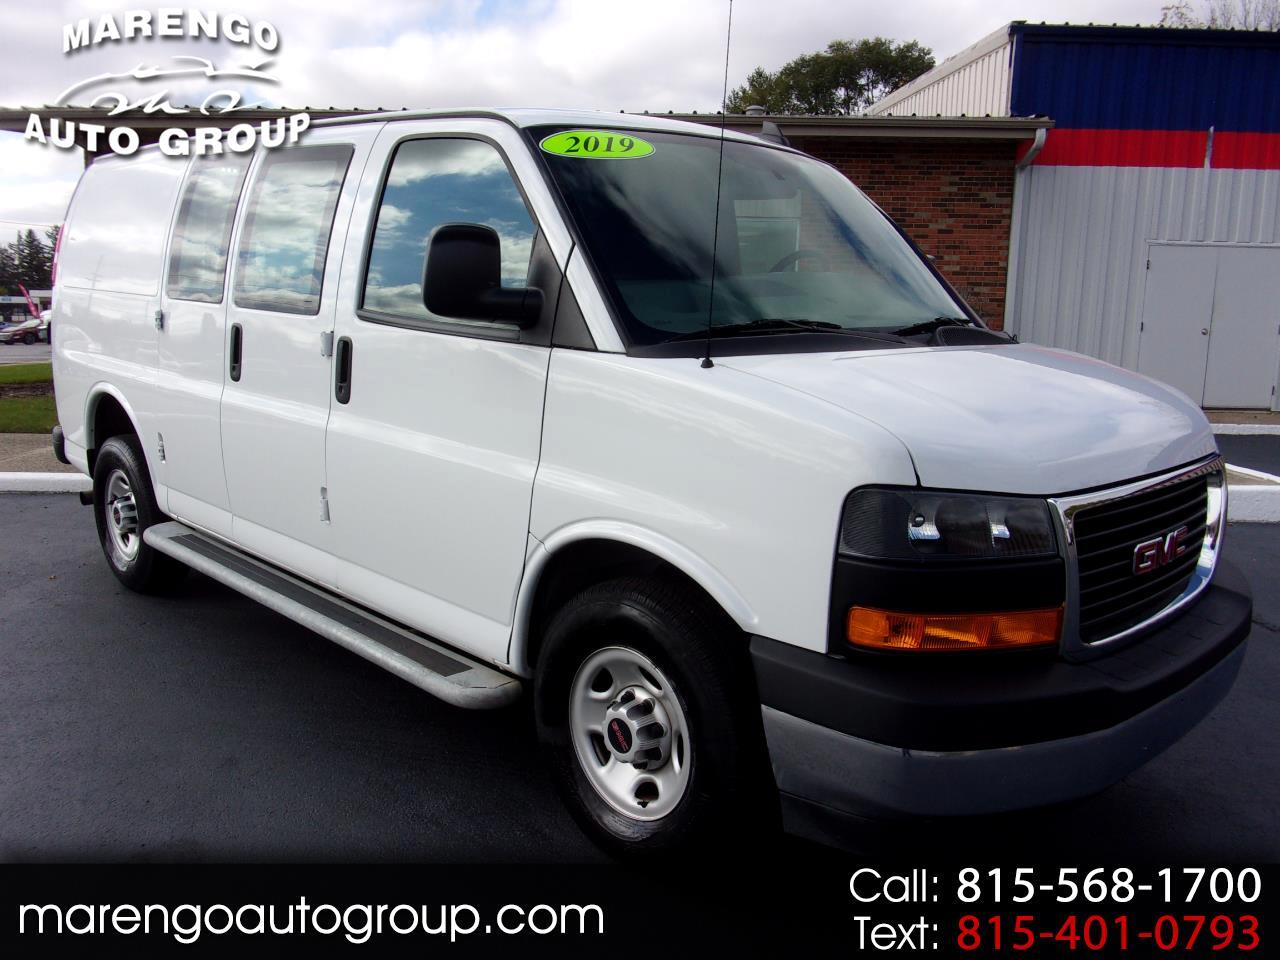 used 2019 GMC Savana Cargo Van car, priced at $24,496